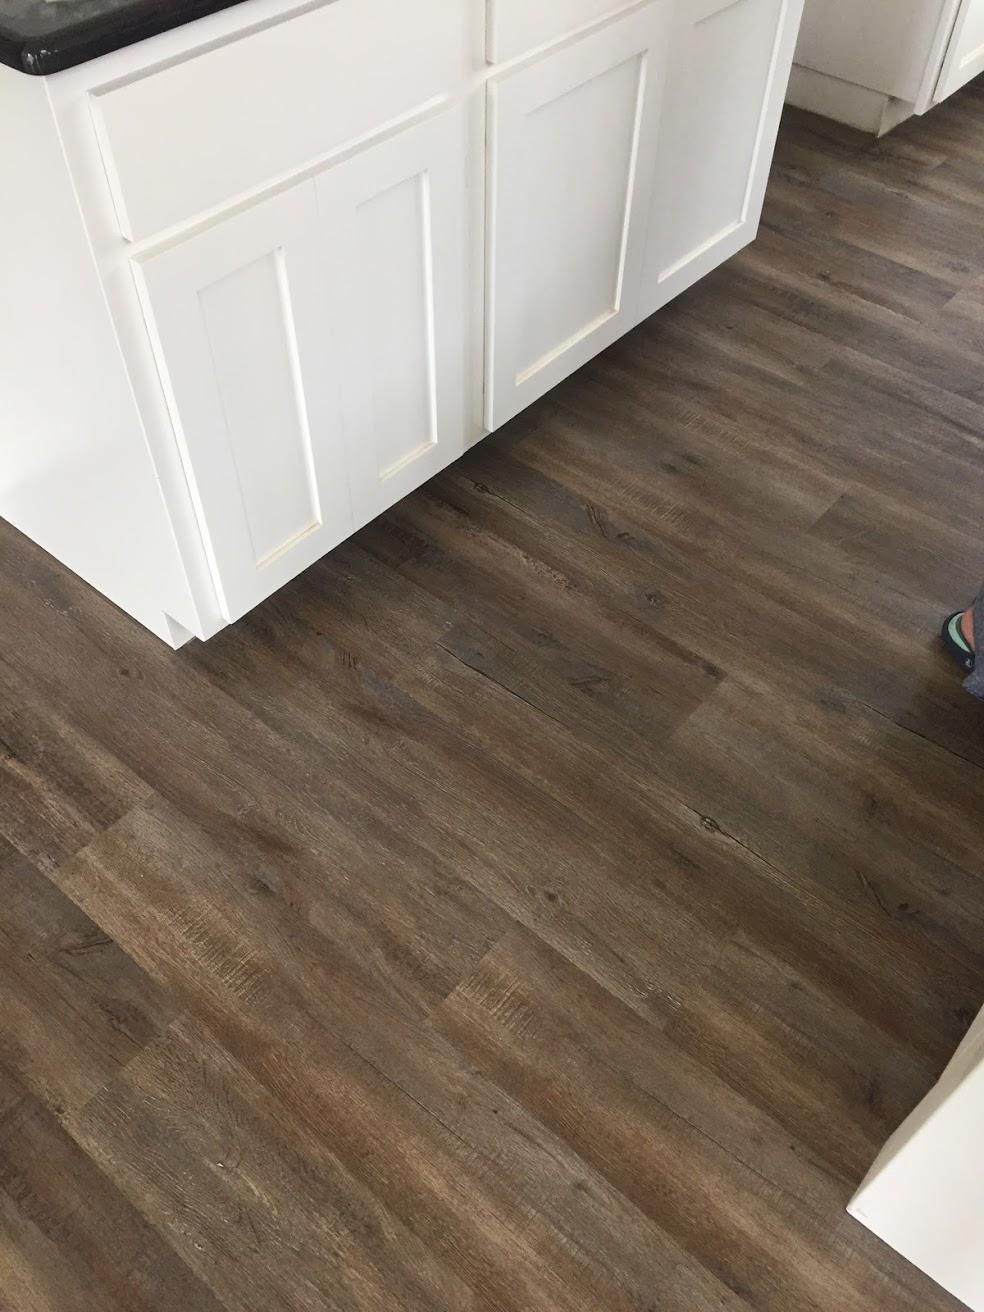 Avenues of Waco Flooring